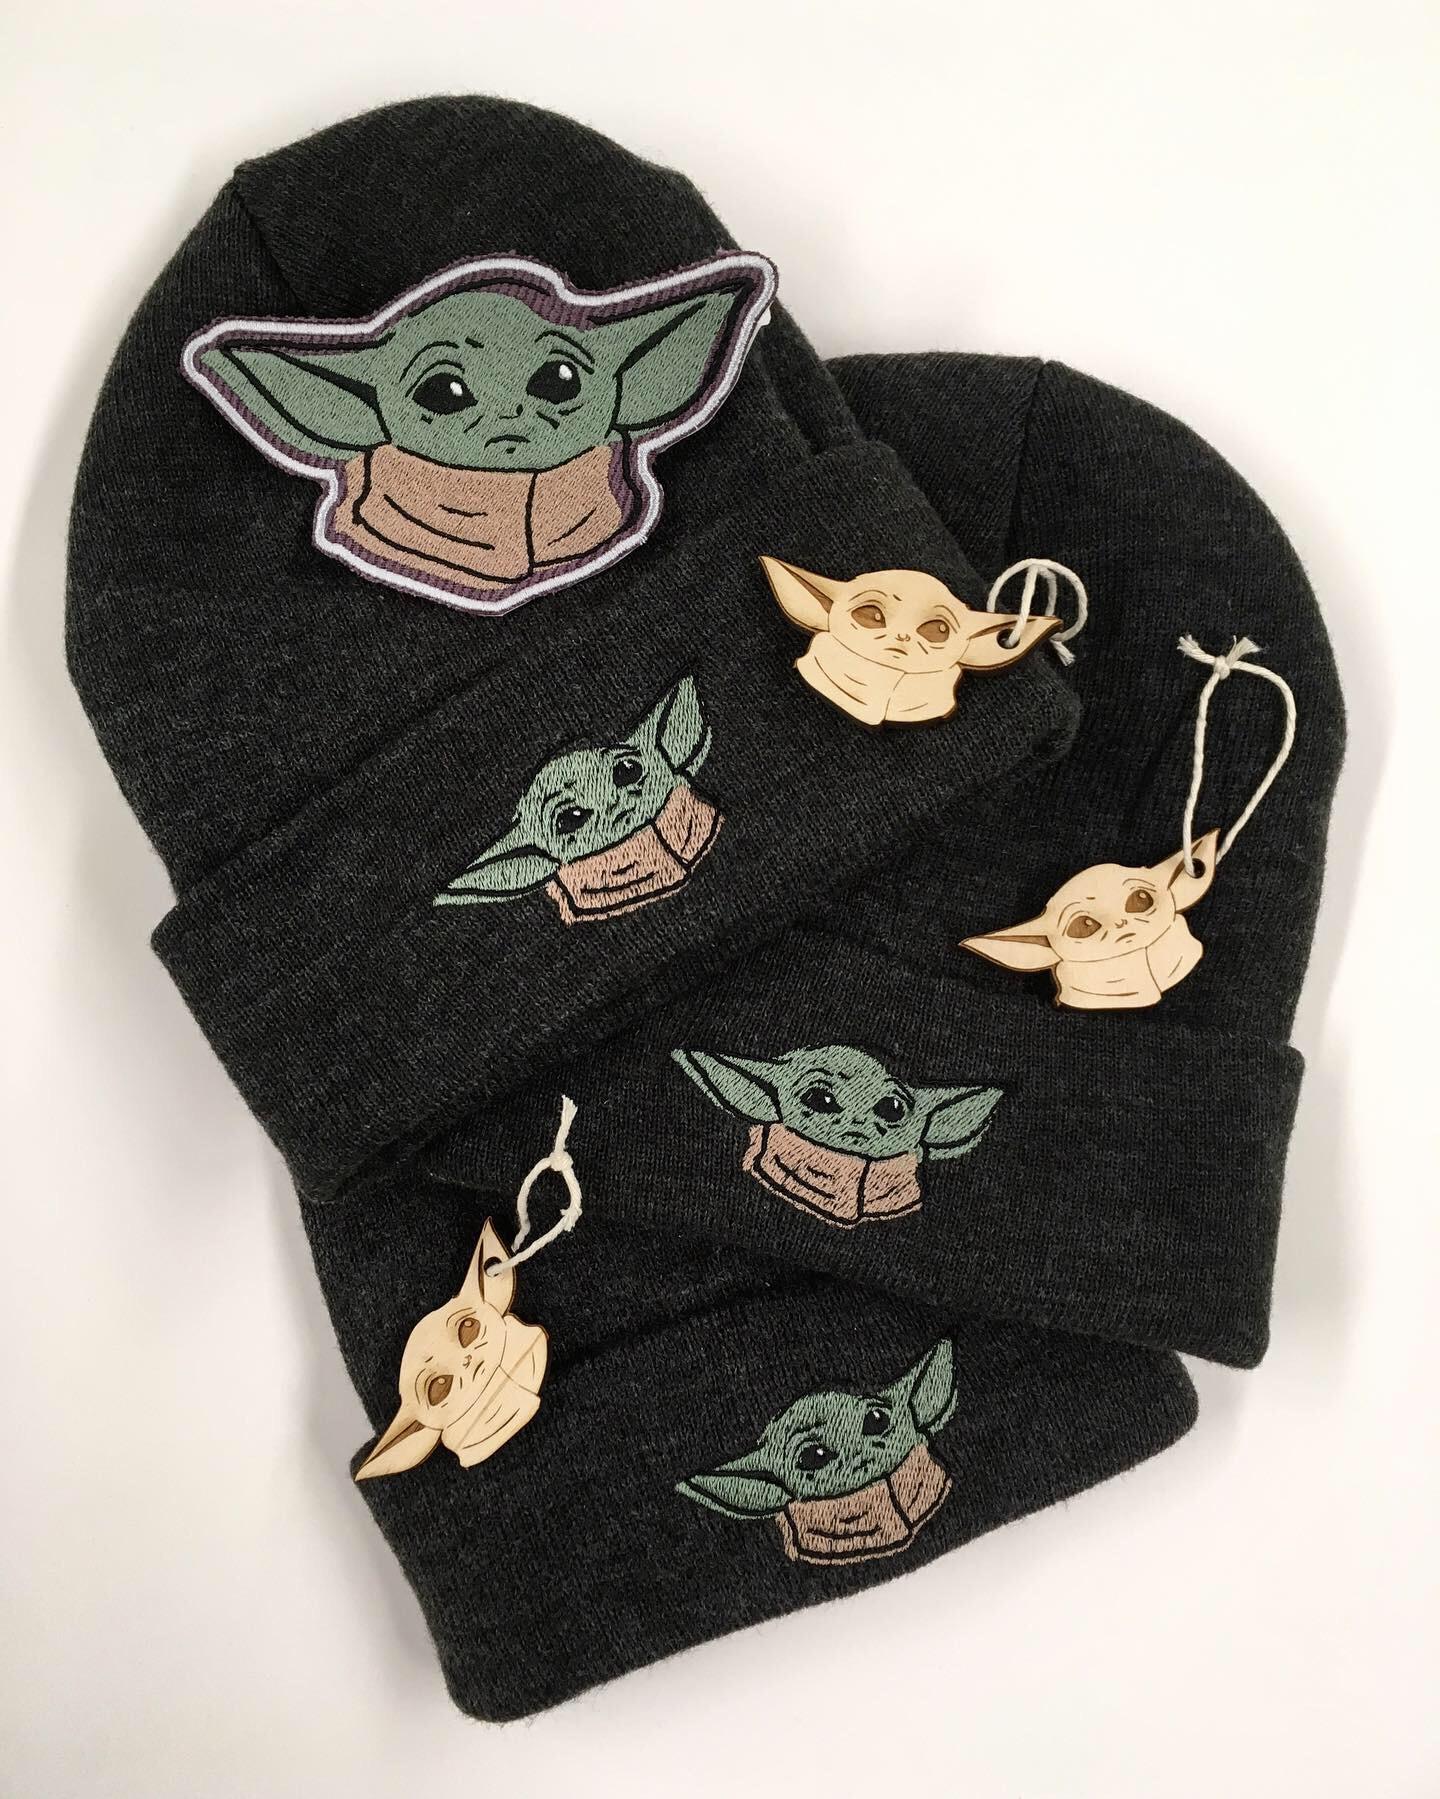 Baby Yoda Christmas Presents